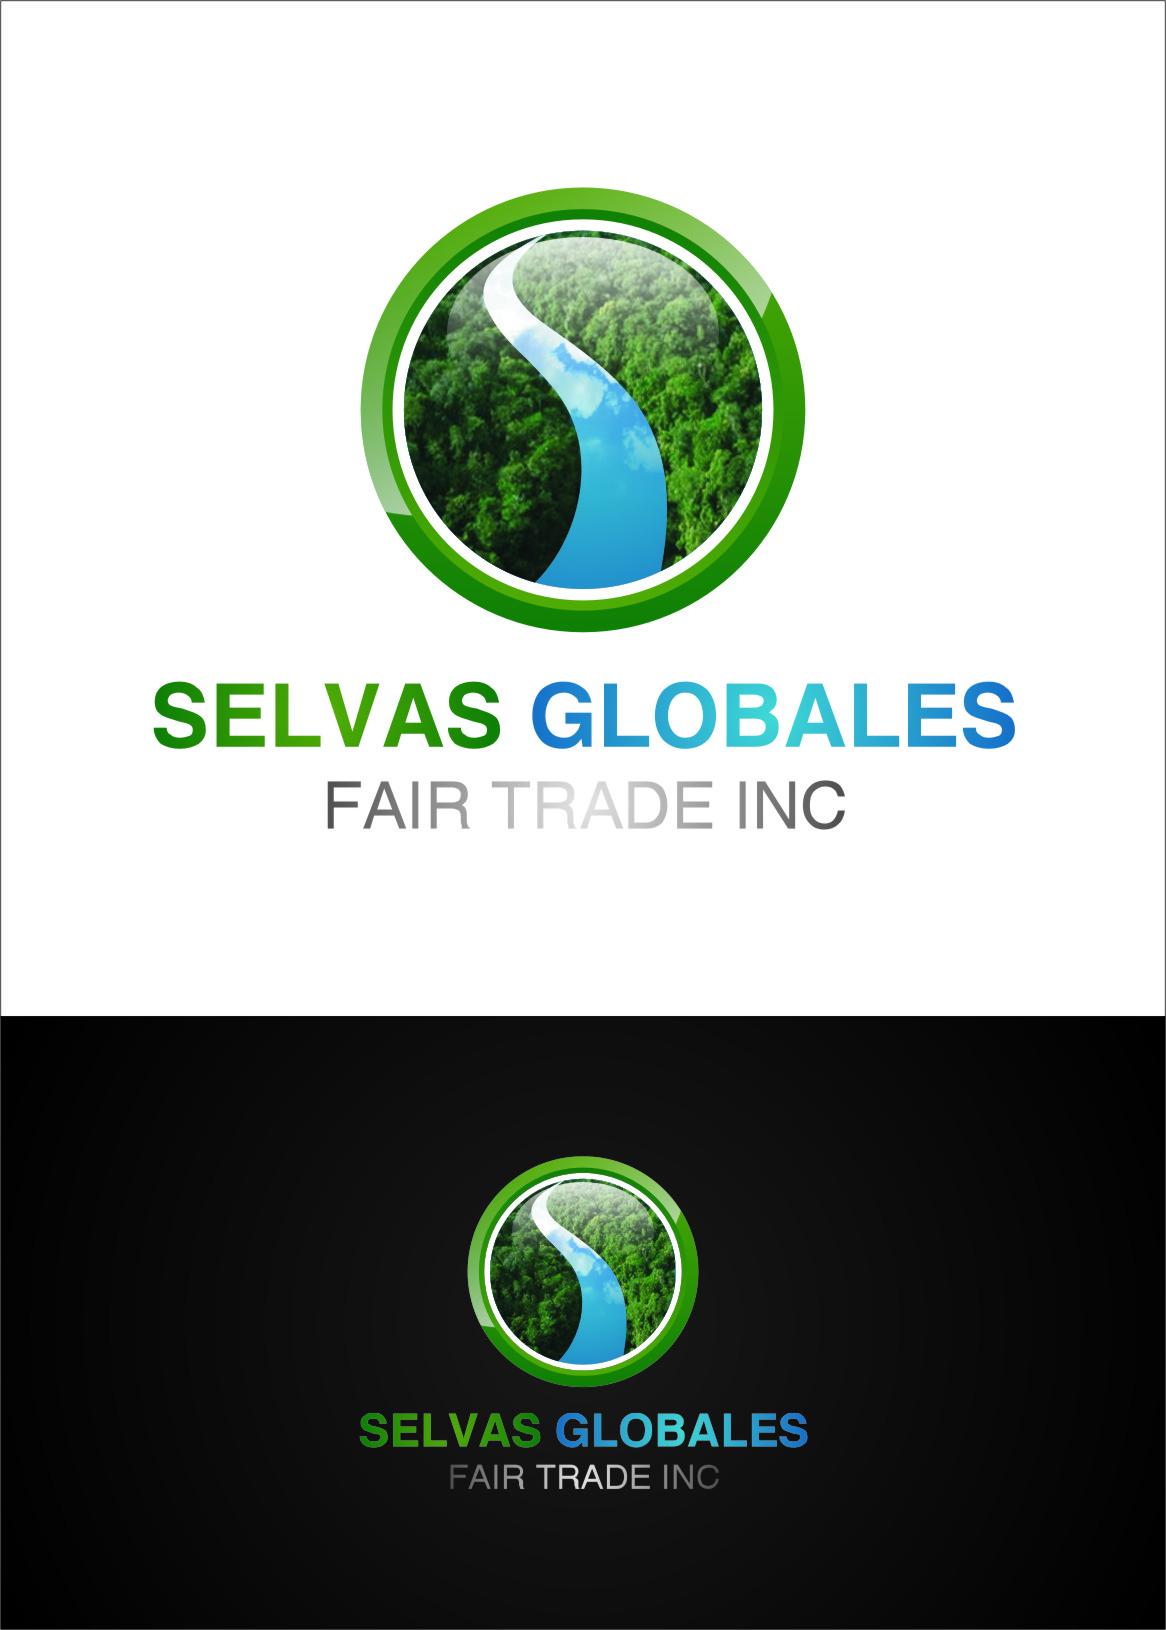 Logo Design by Ngepet_art - Entry No. 119 in the Logo Design Contest Captivating Logo Design for Selvas Globales Fair Trade Inc..